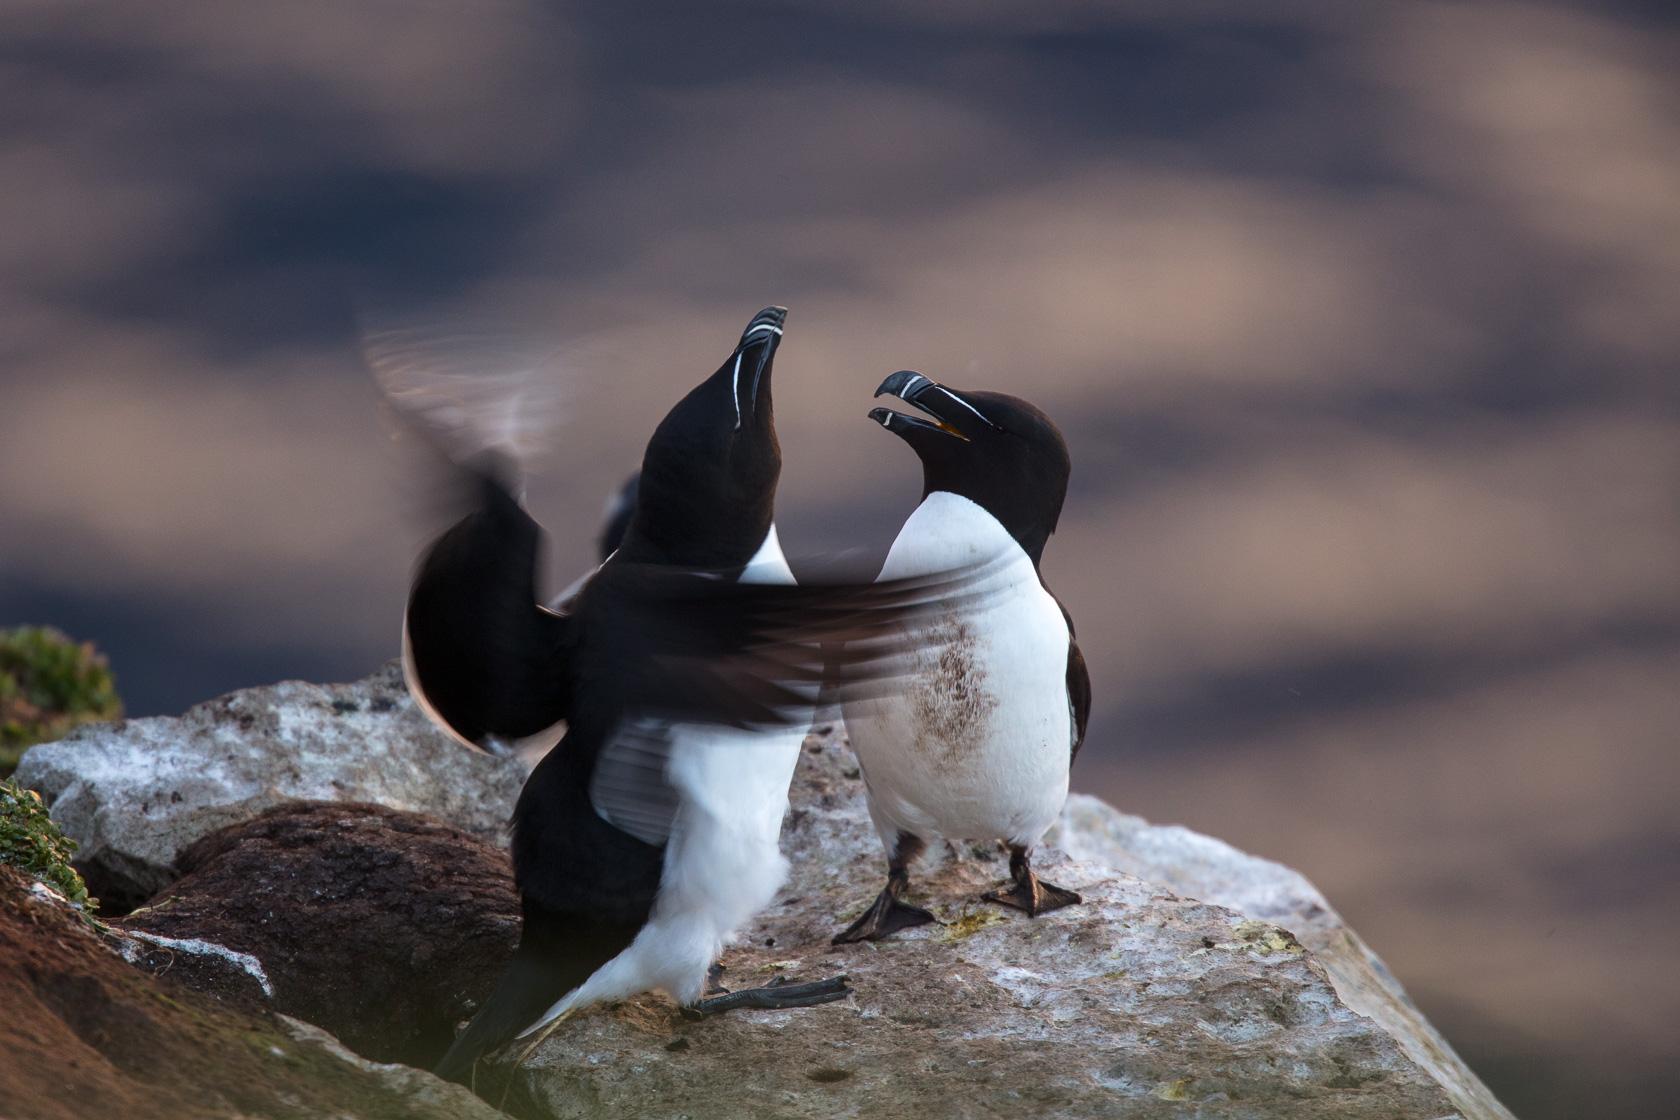 parade nuptiale de Pingouin torda (Alca torda) sur l'île d'Hornøya, en Norvège